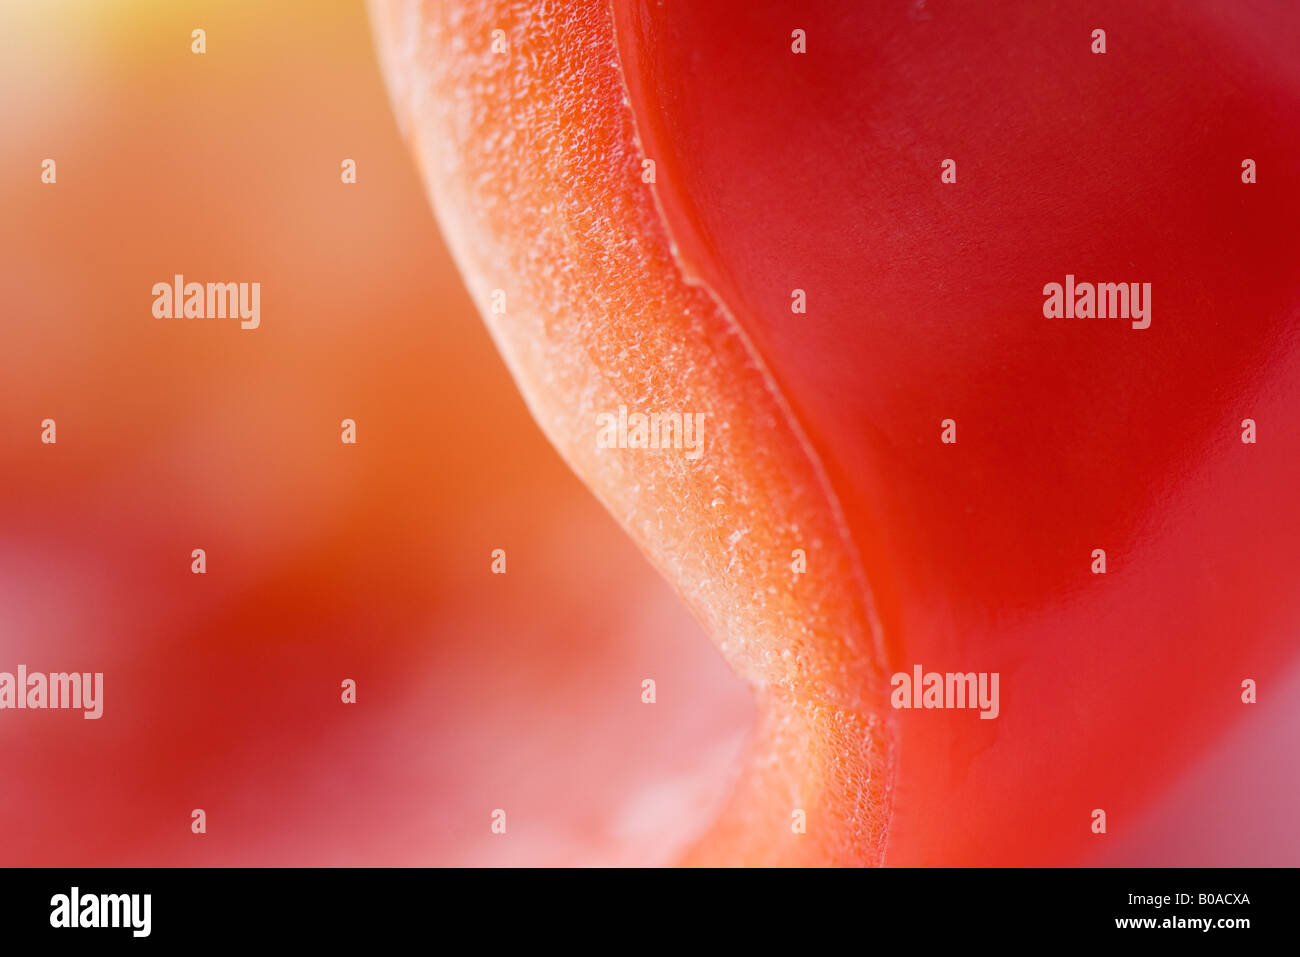 Rote Paprika, extreme Nahaufnahme Stockbild